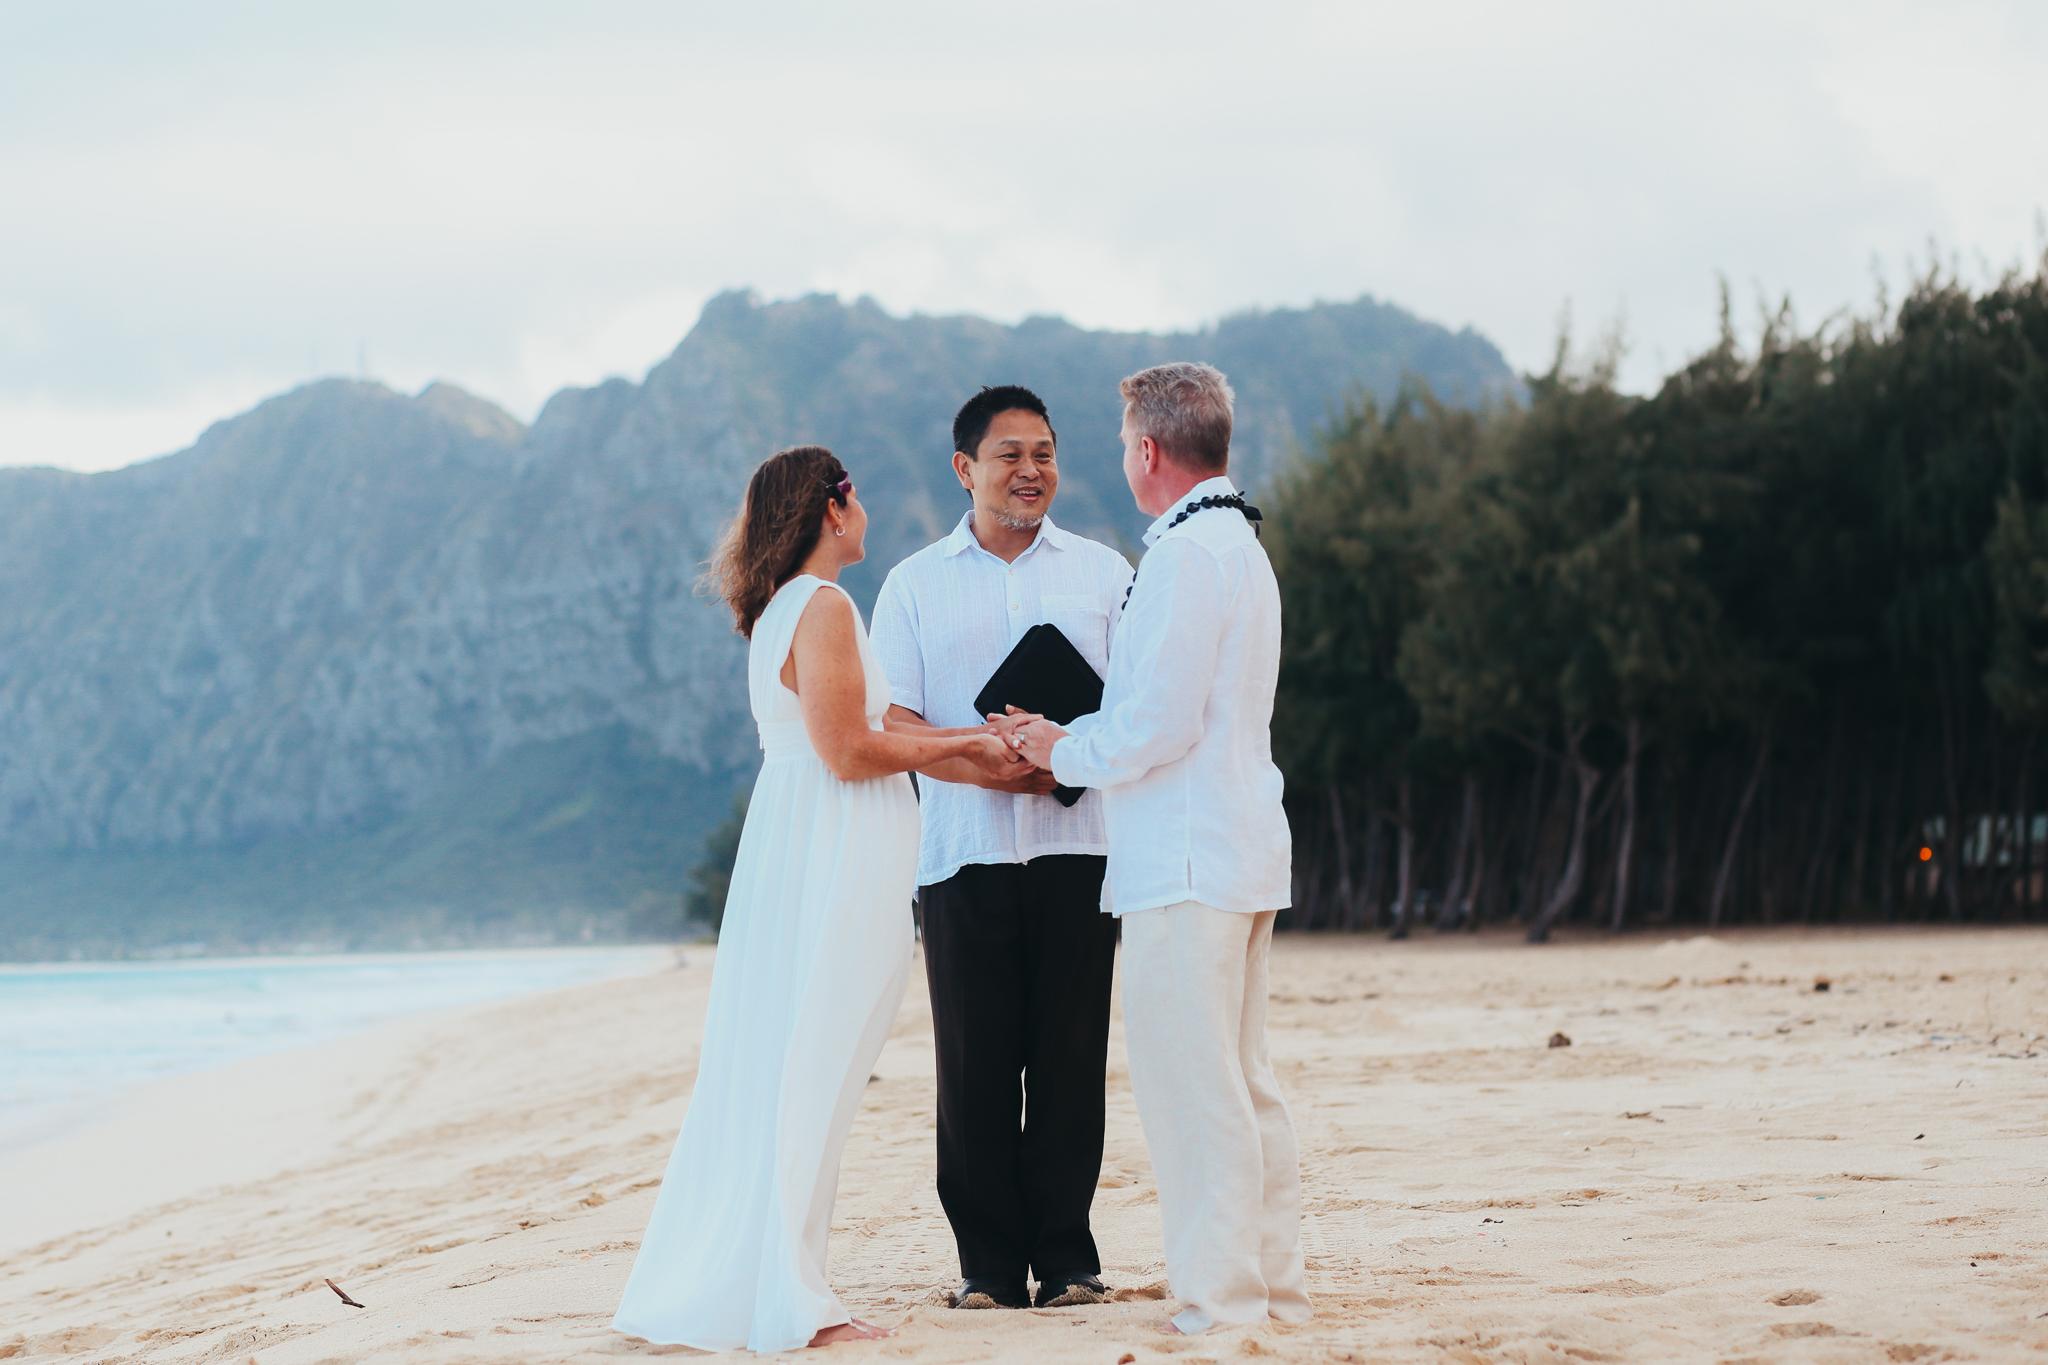 IG, aloha sunshine photography, beach wedding, hawaii photographer, hawaii, hawaii wedding, oahu wedding, hawaii wedding photographer, oahu wedding photographer,16January 31, 2018.jpg